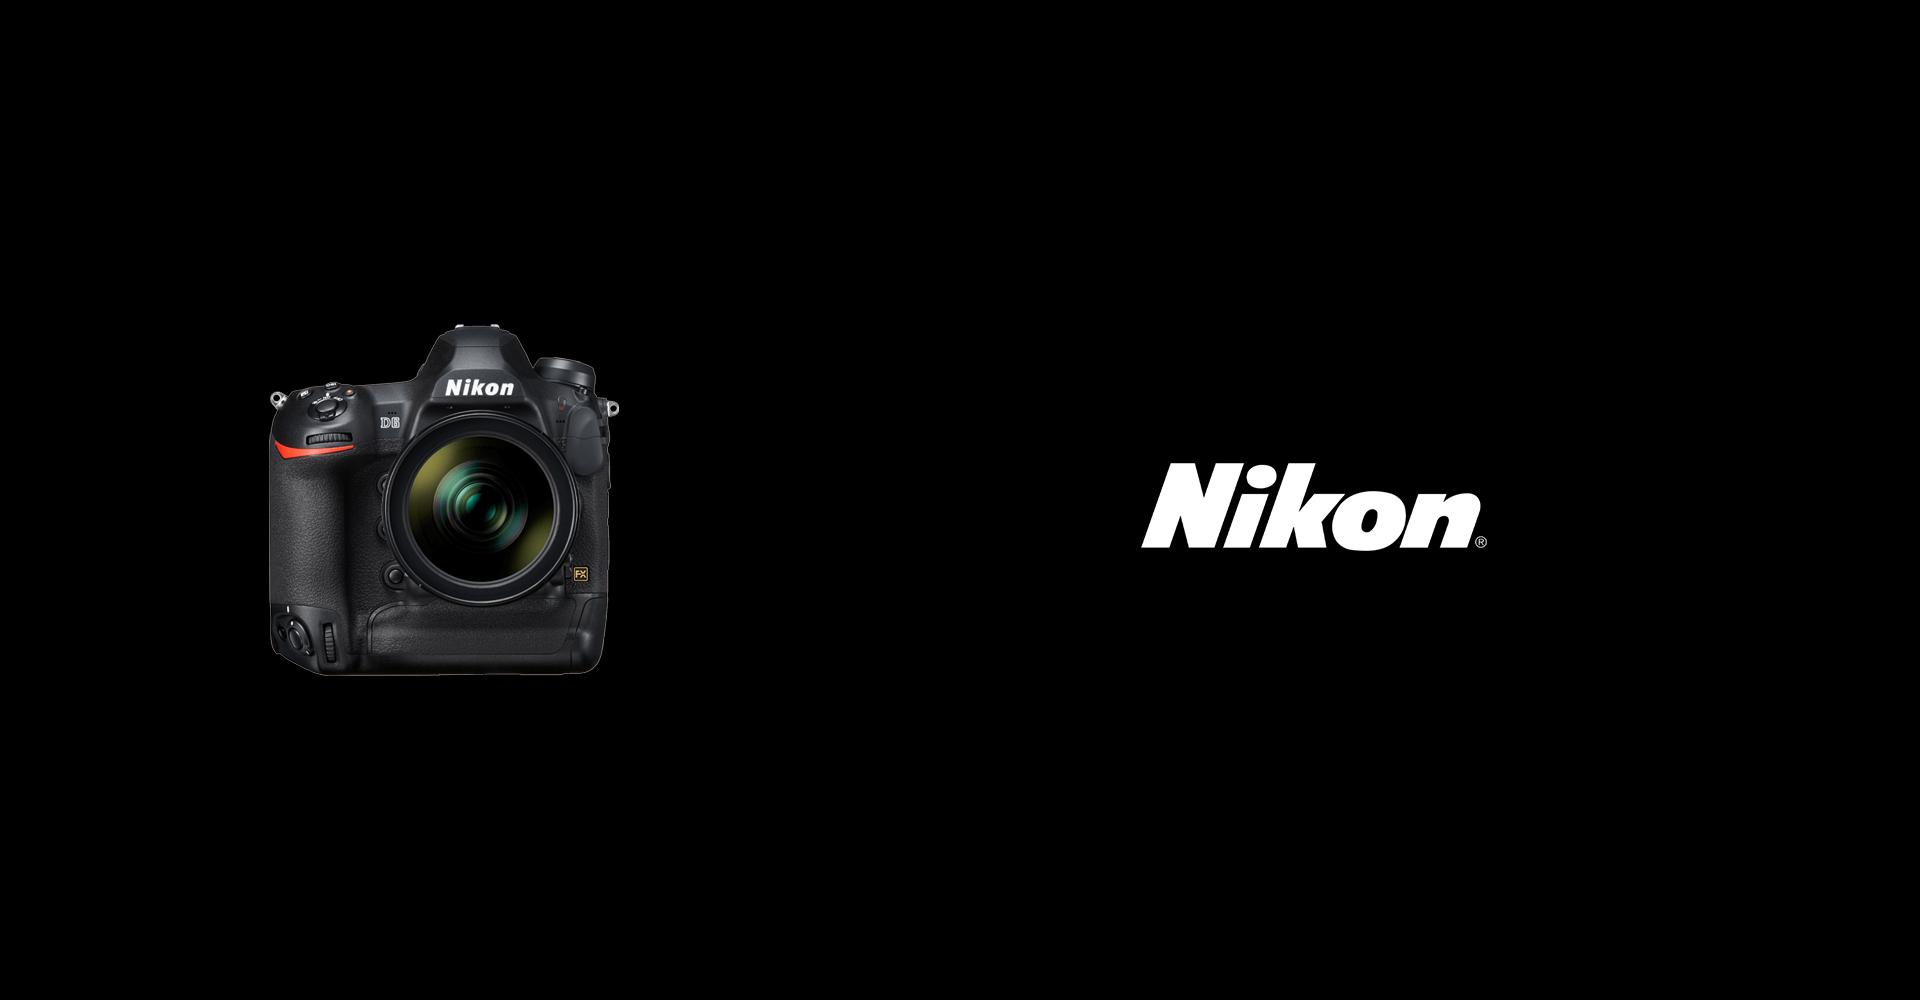 Nikon Markenshop